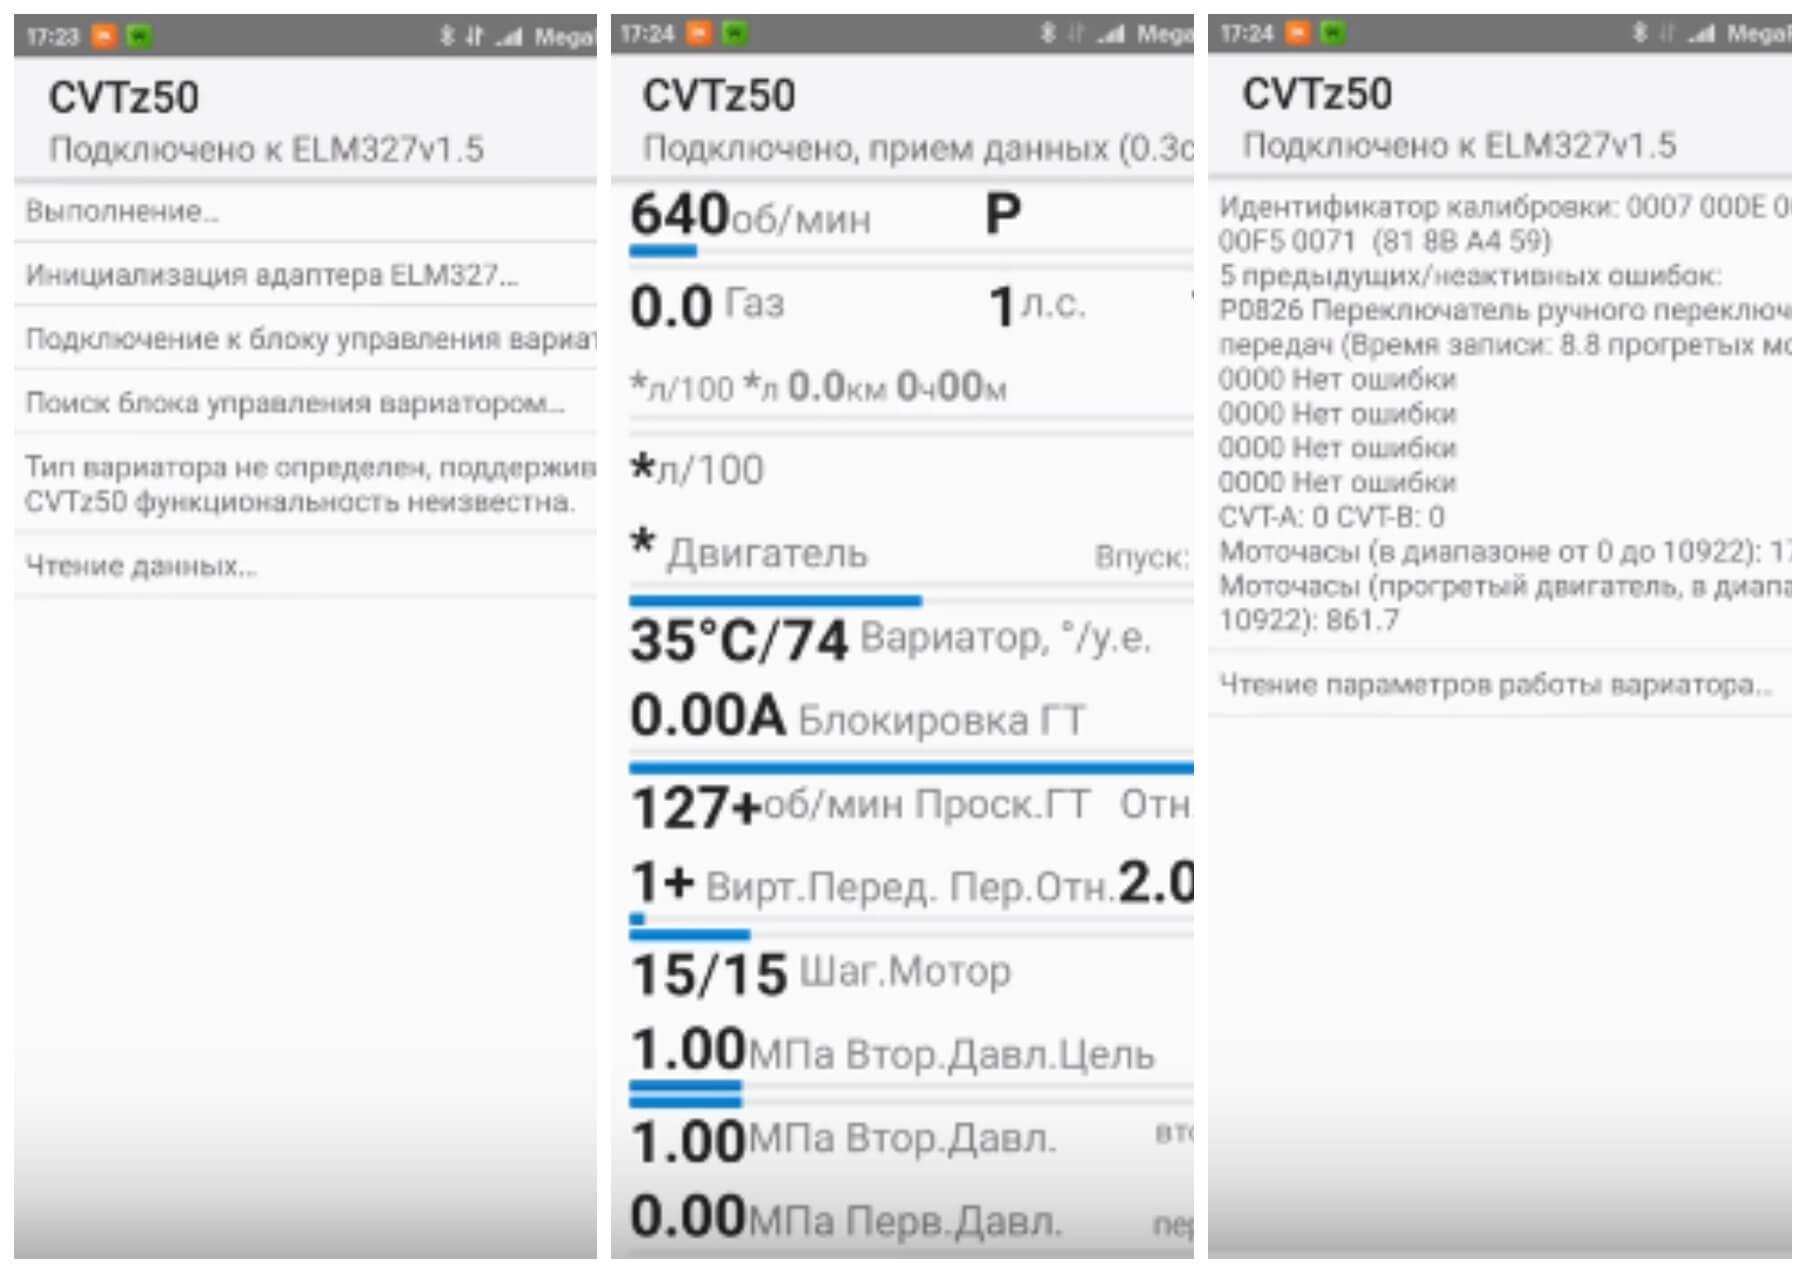 На фото изображено приложение CVTz50.